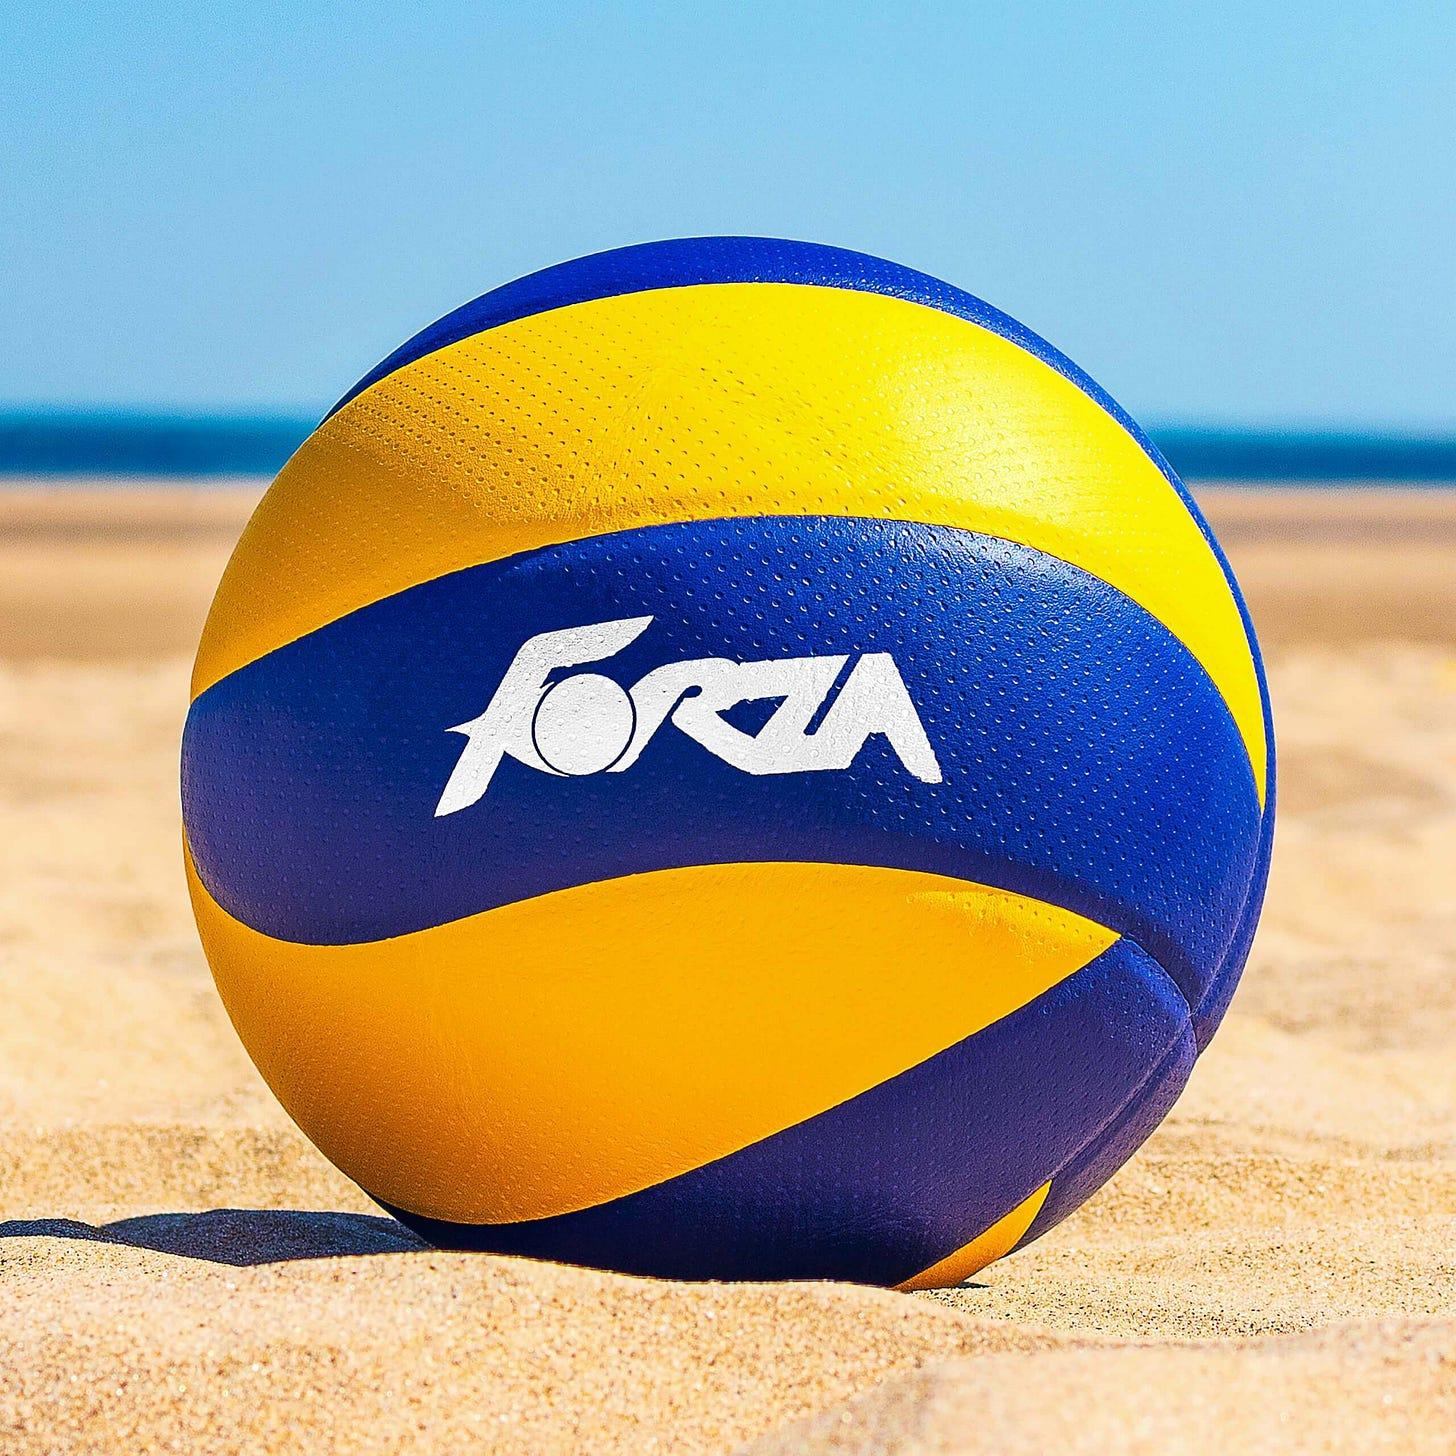 FORZA Tournament Volleyball | Net World Sports